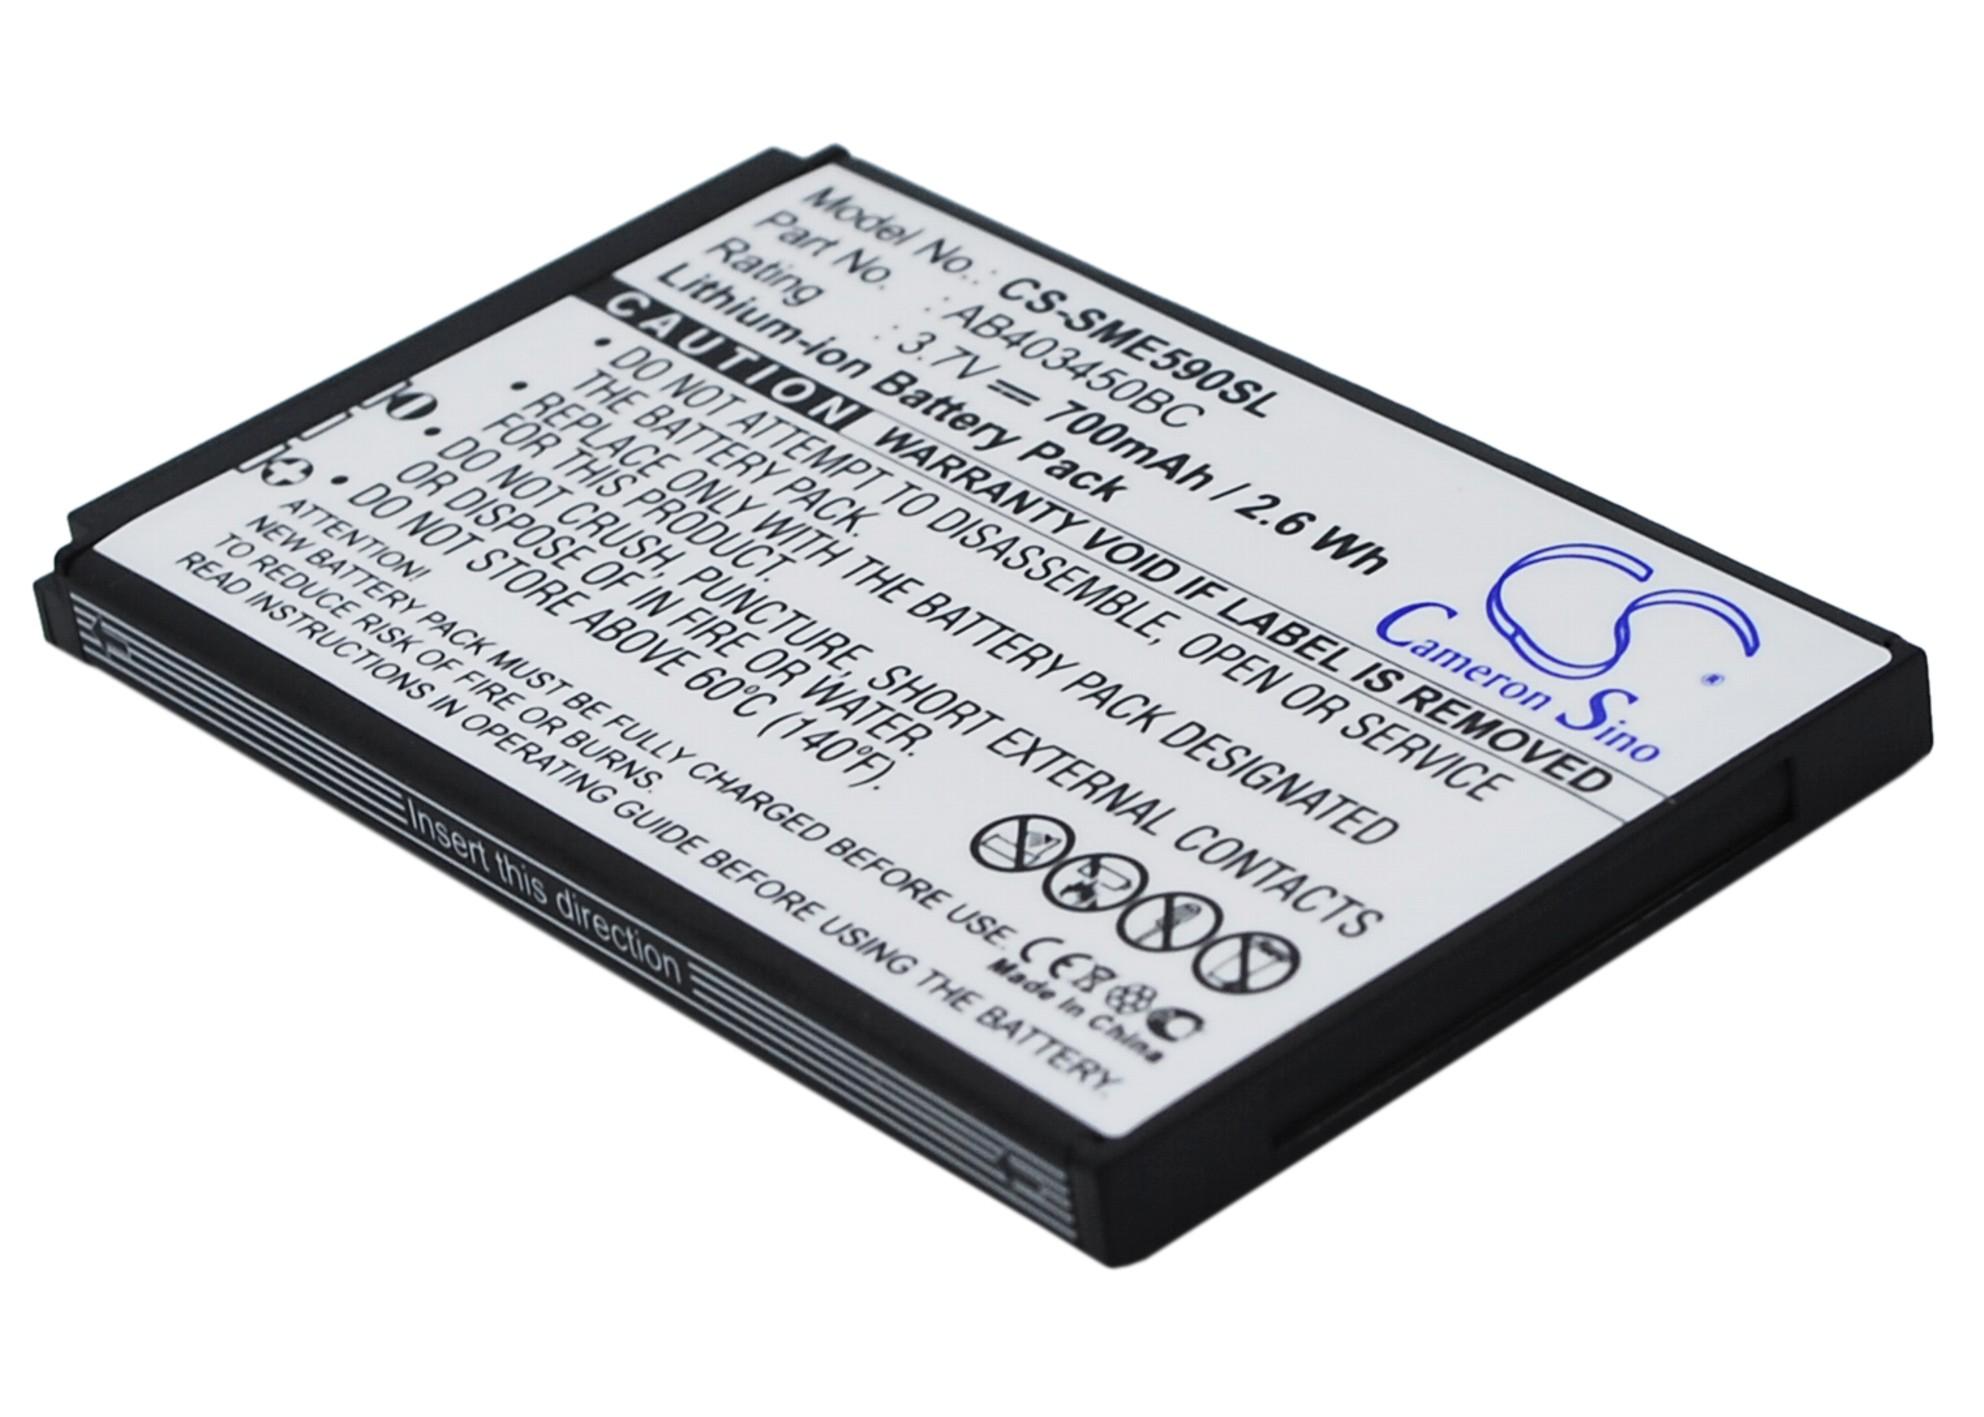 Cameron Sino baterie do mobilů pro SAMSUNG GT-S3550 Shark3 3.7V Li-ion 700mAh černá - neoriginální